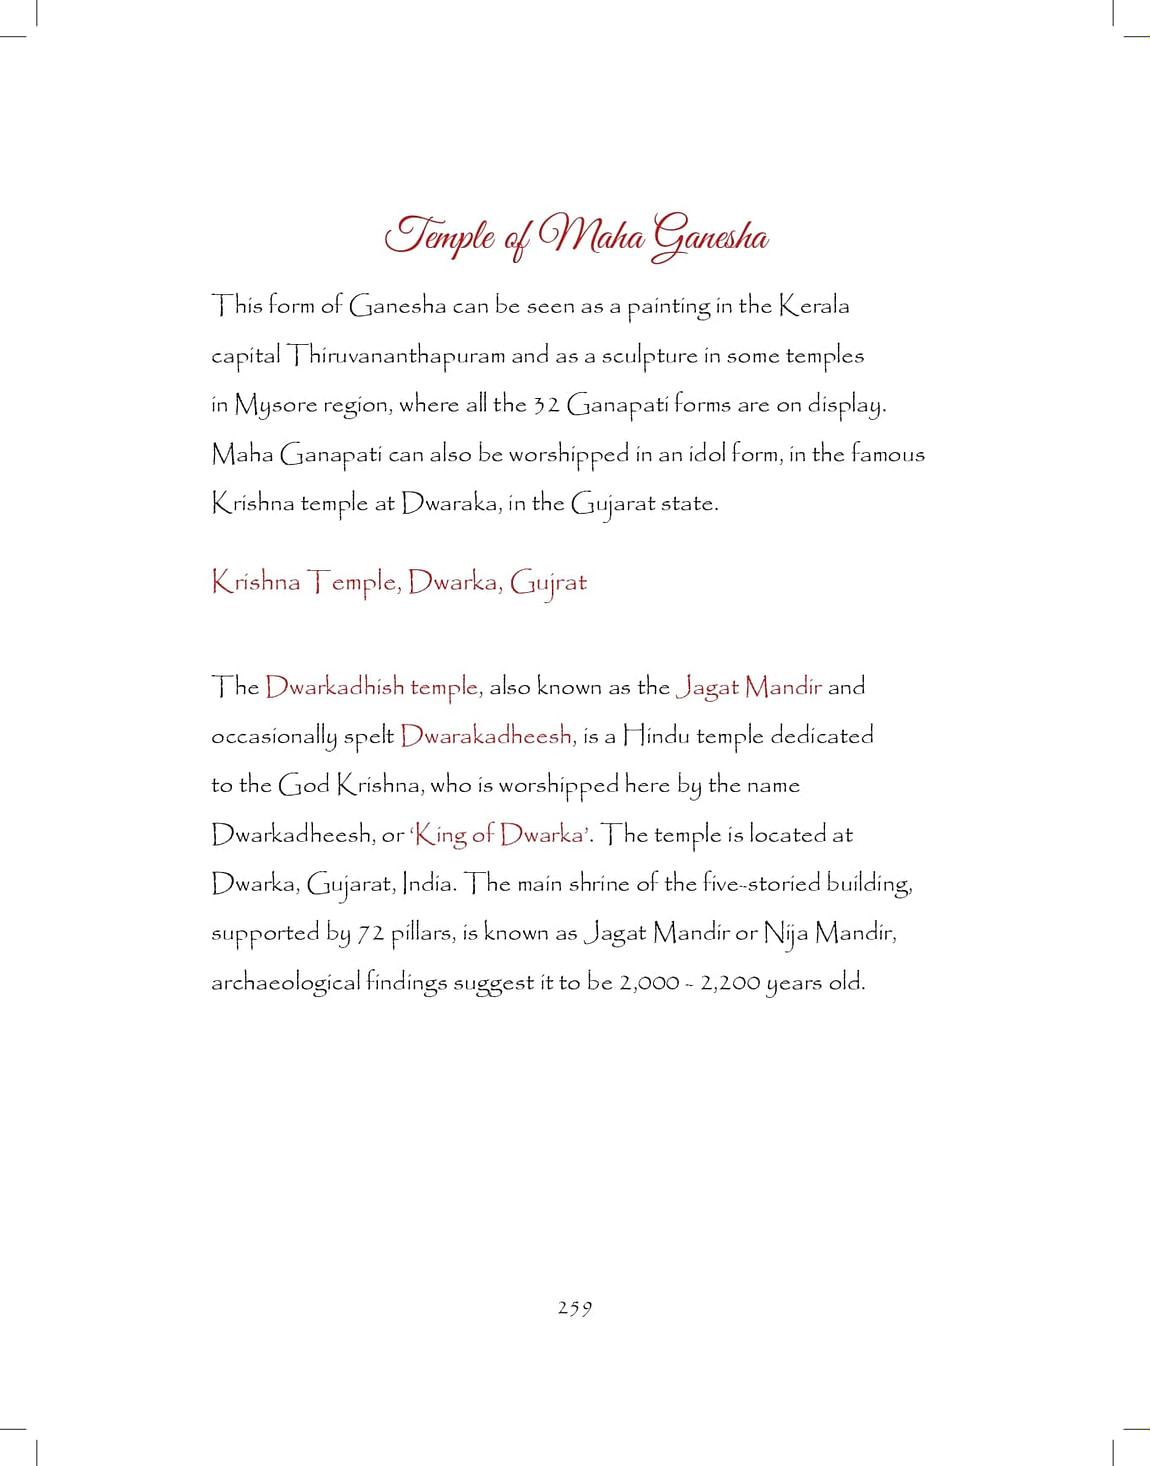 Ganesh-print_pages-to-jpg-0259.jpg